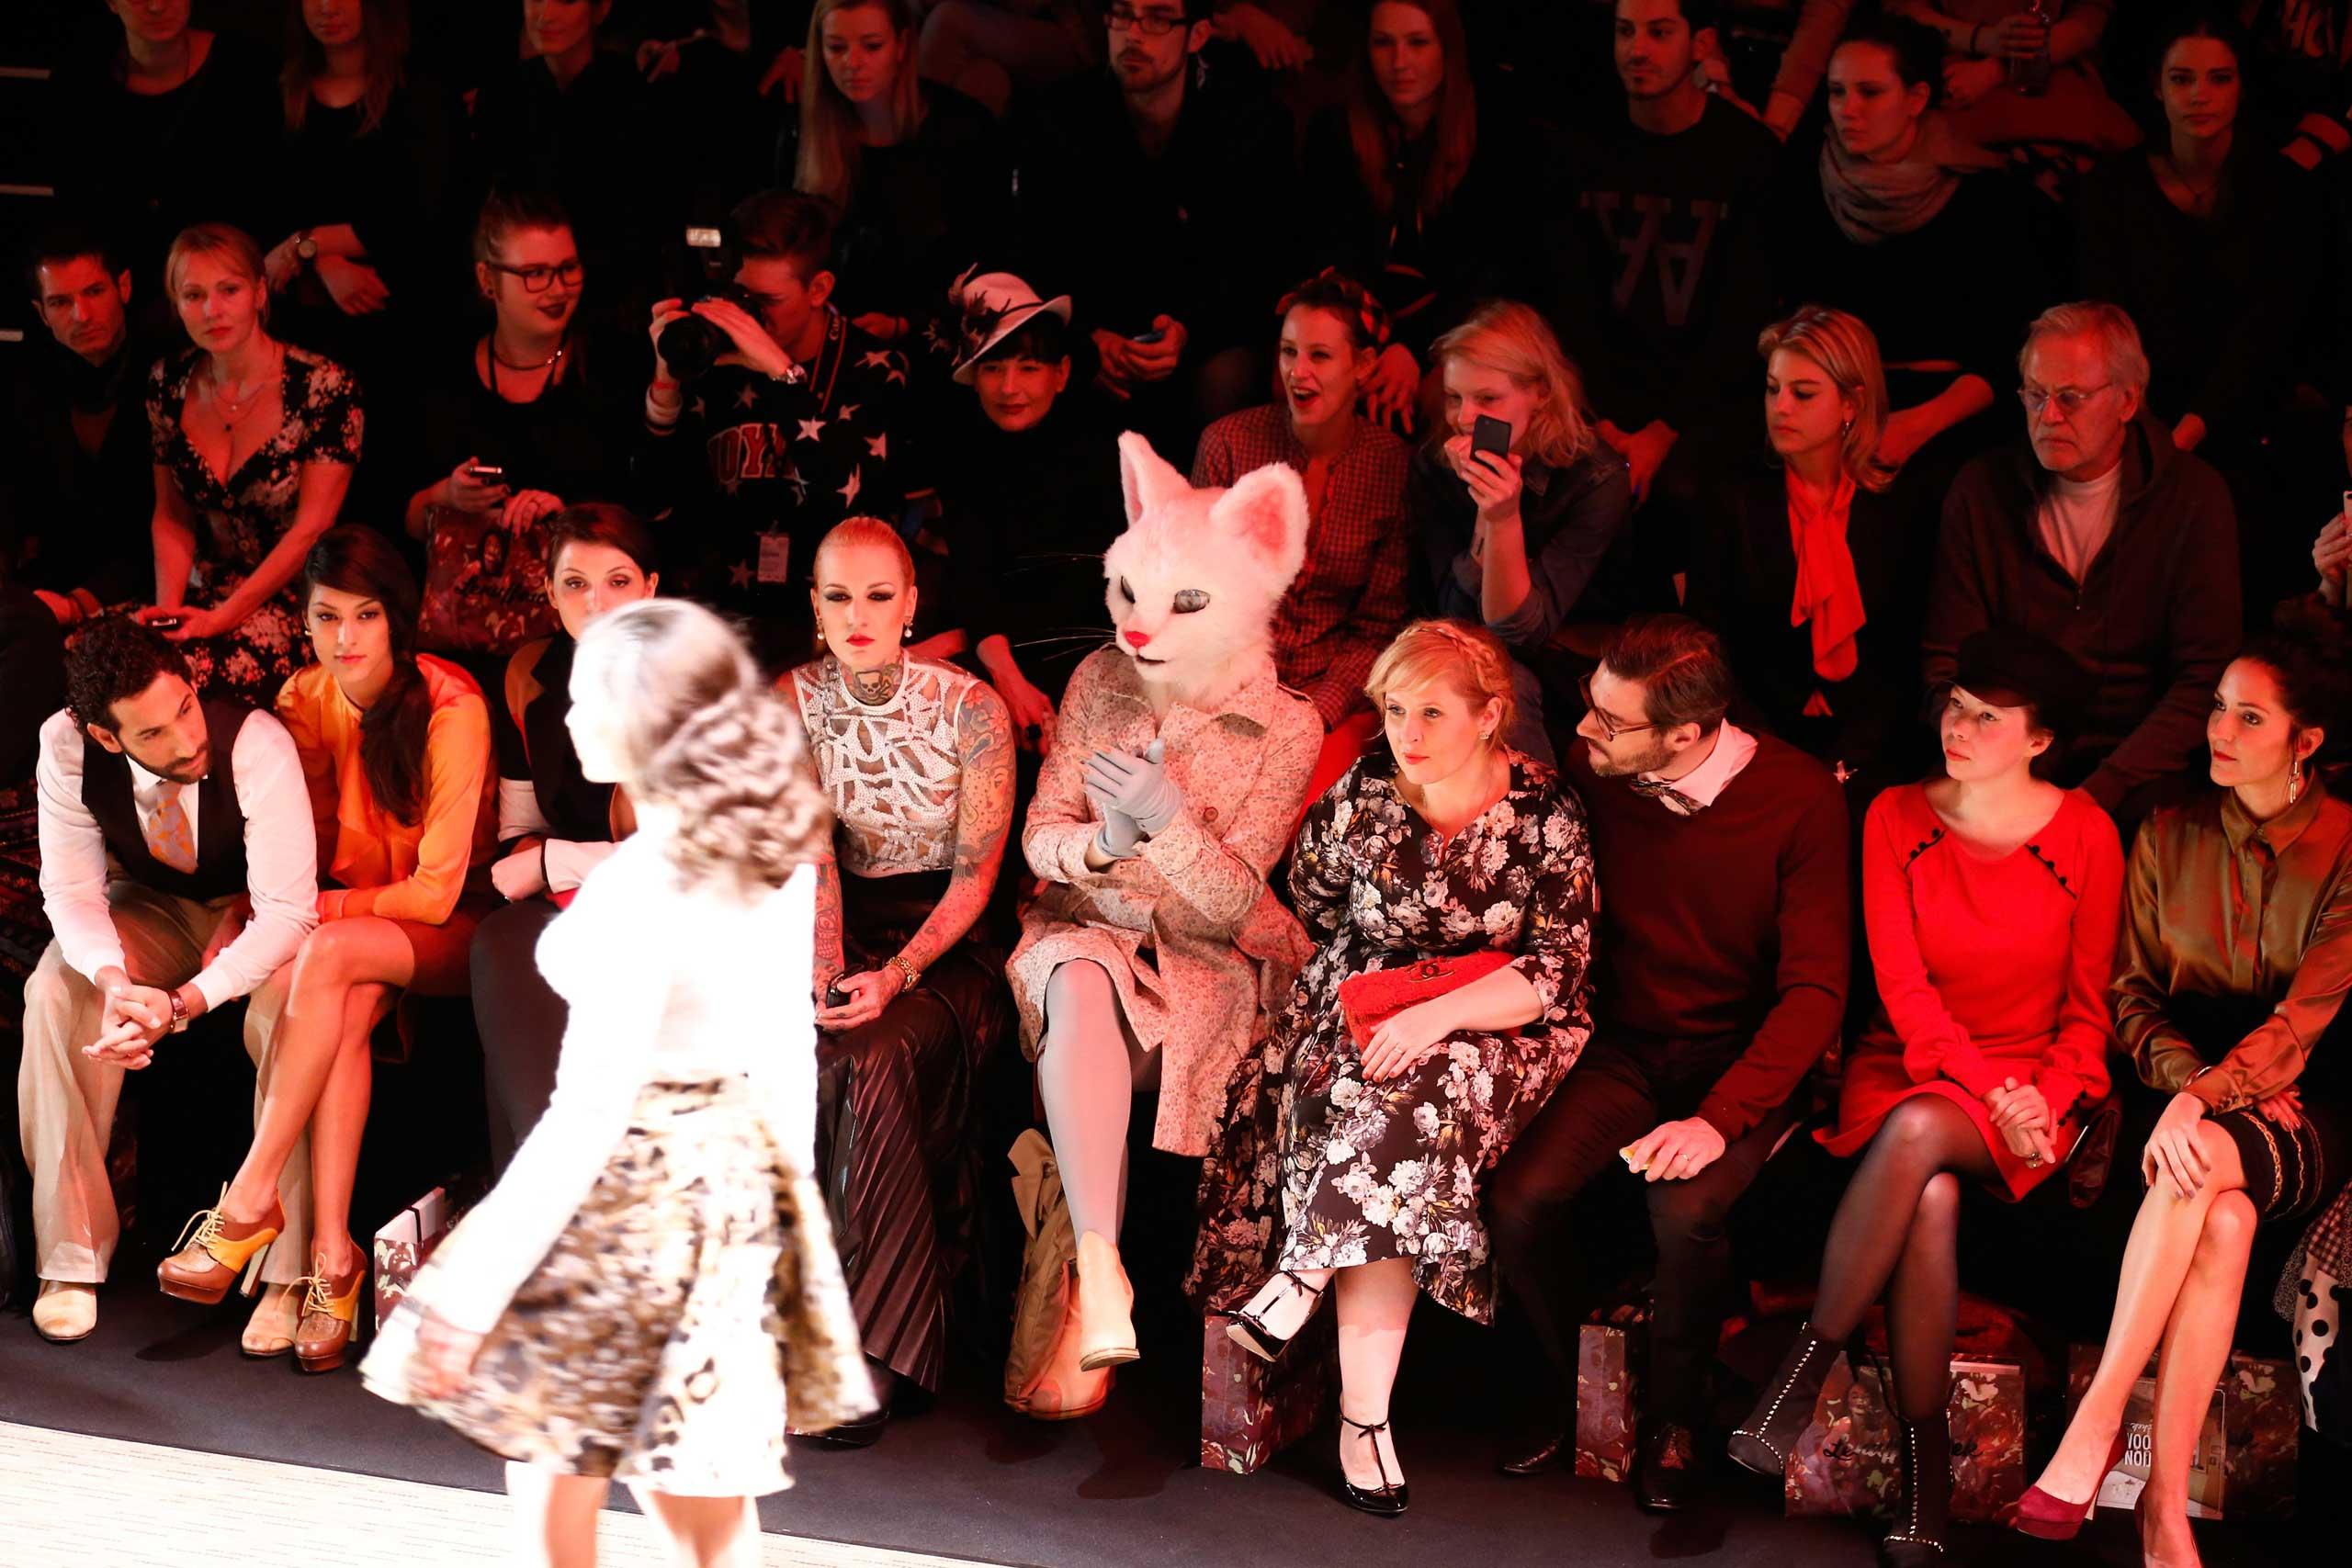 From left to right, Massimo Sinato, Rebecca Mir, Lexy Hill, Maite Kelly, Florent Raimond, guest, Johanna Klum attend the Rebekka Ruetz show during Mercedes-Benz Fashion Week Autumn/Winter 2014/15 at Brandenburg Gate in Berlin, Jan. 14, 2014.